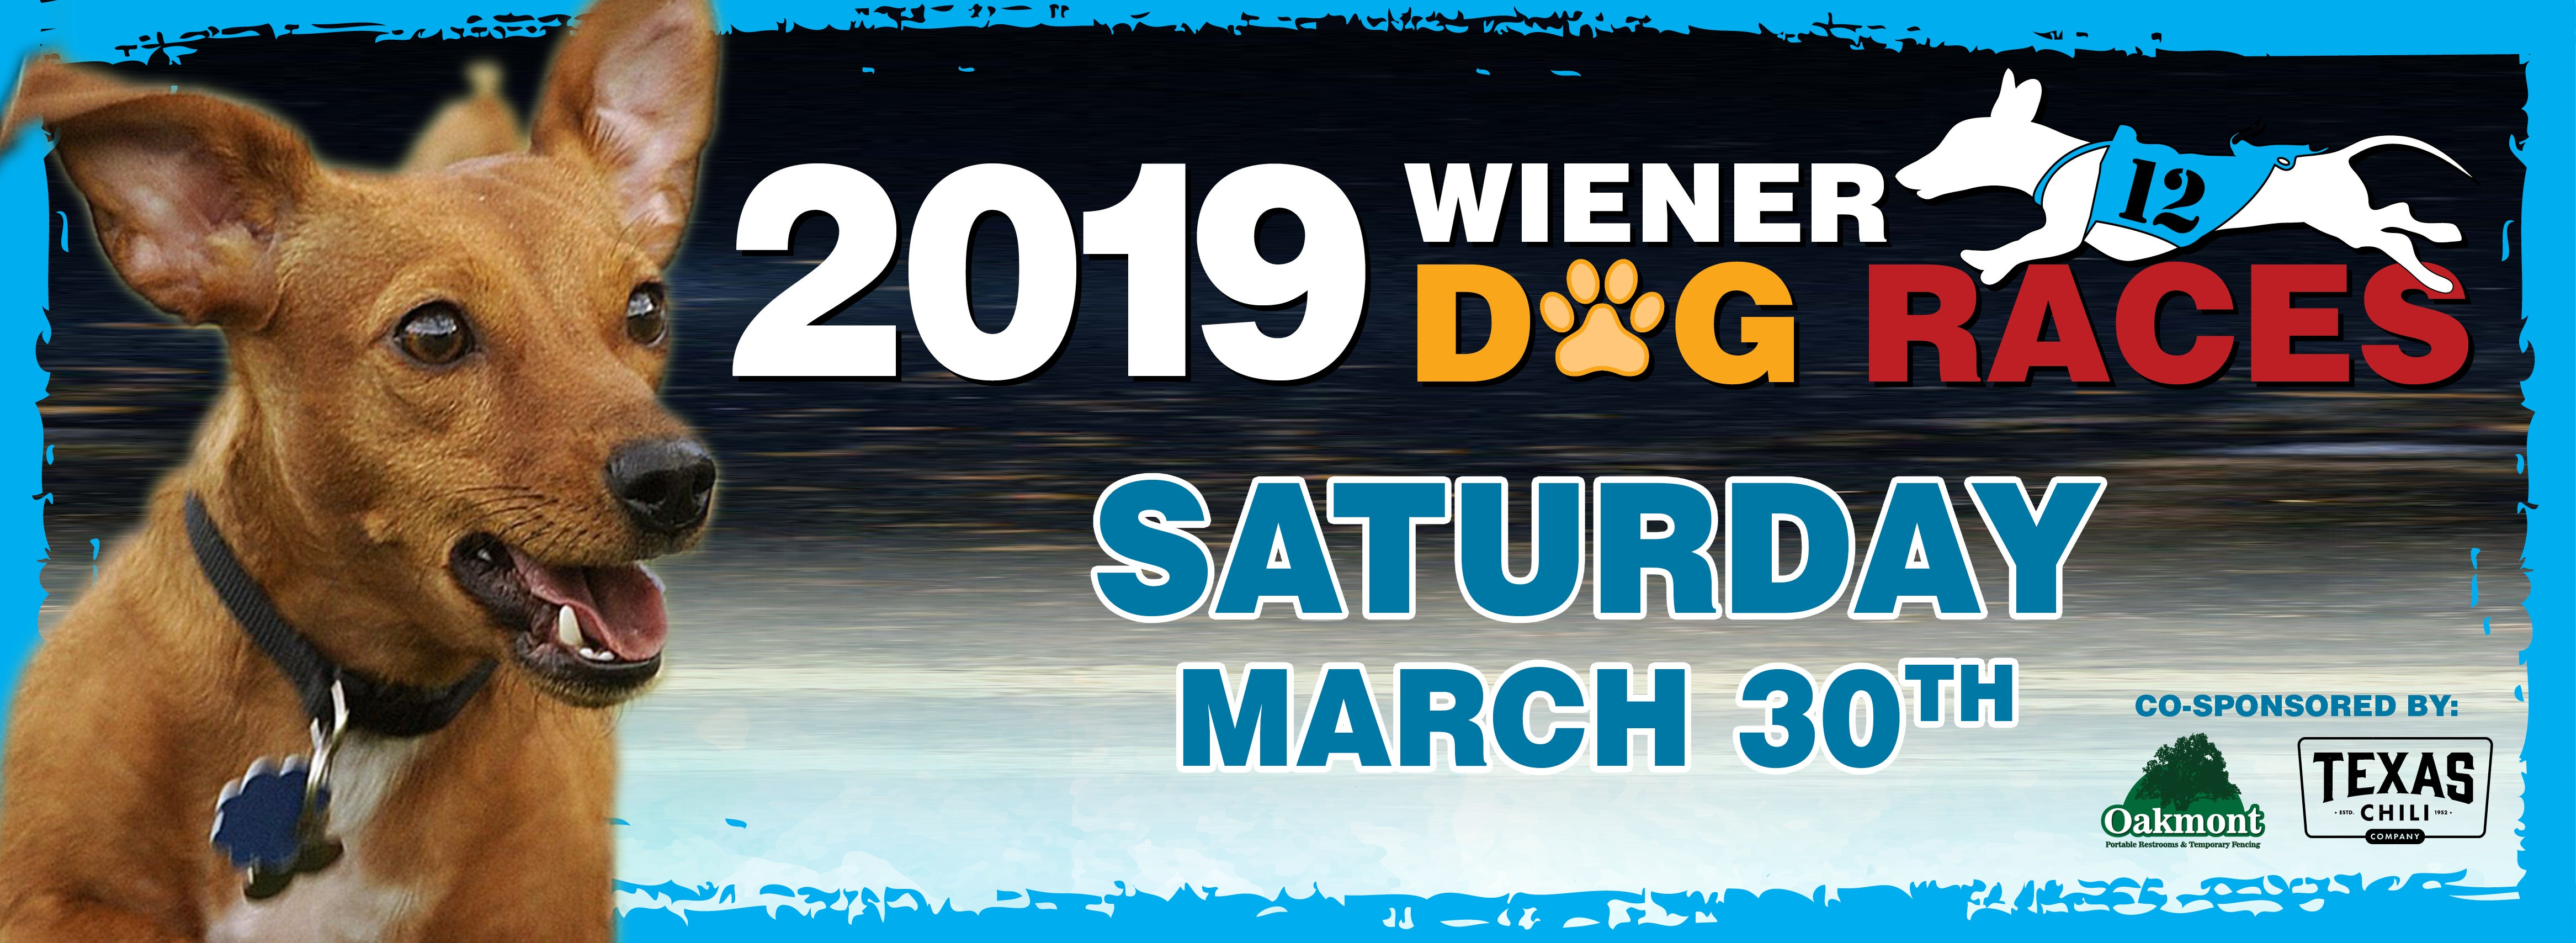 2019-WIENER.DOG.RACES.1120X410.jpg